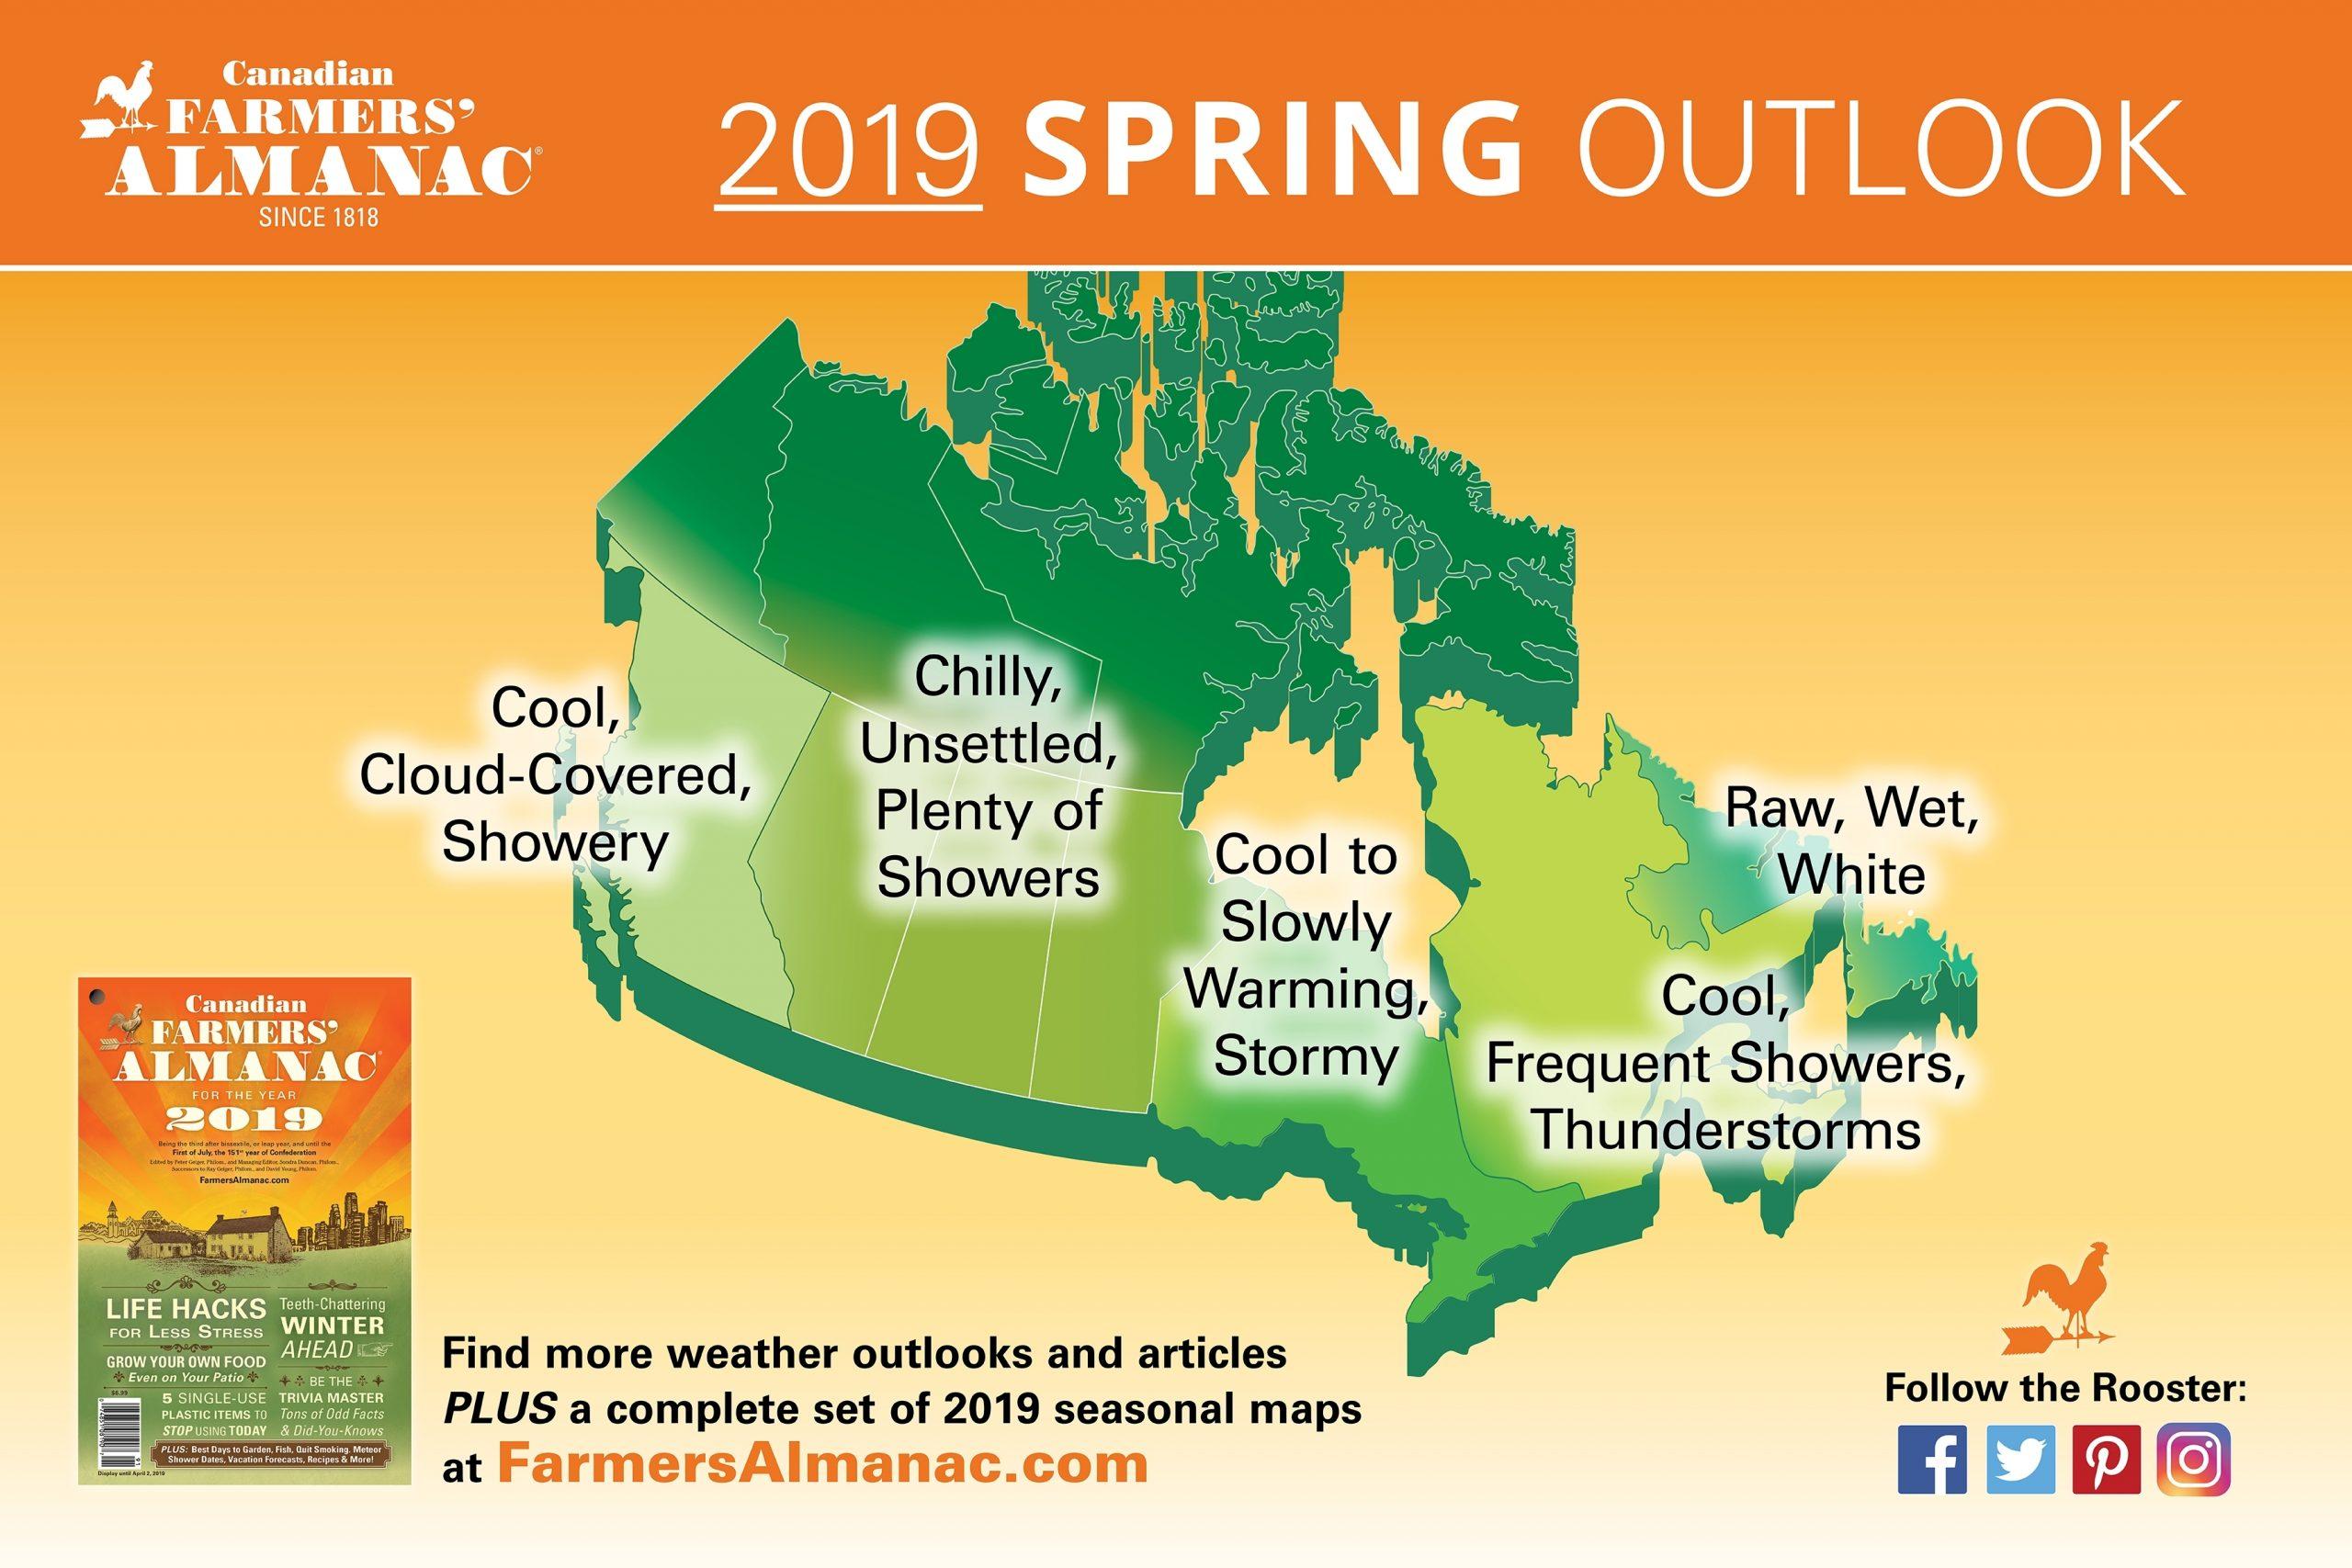 2020 Spring Forecast: Stormy Weather? - Farmers' Almanac